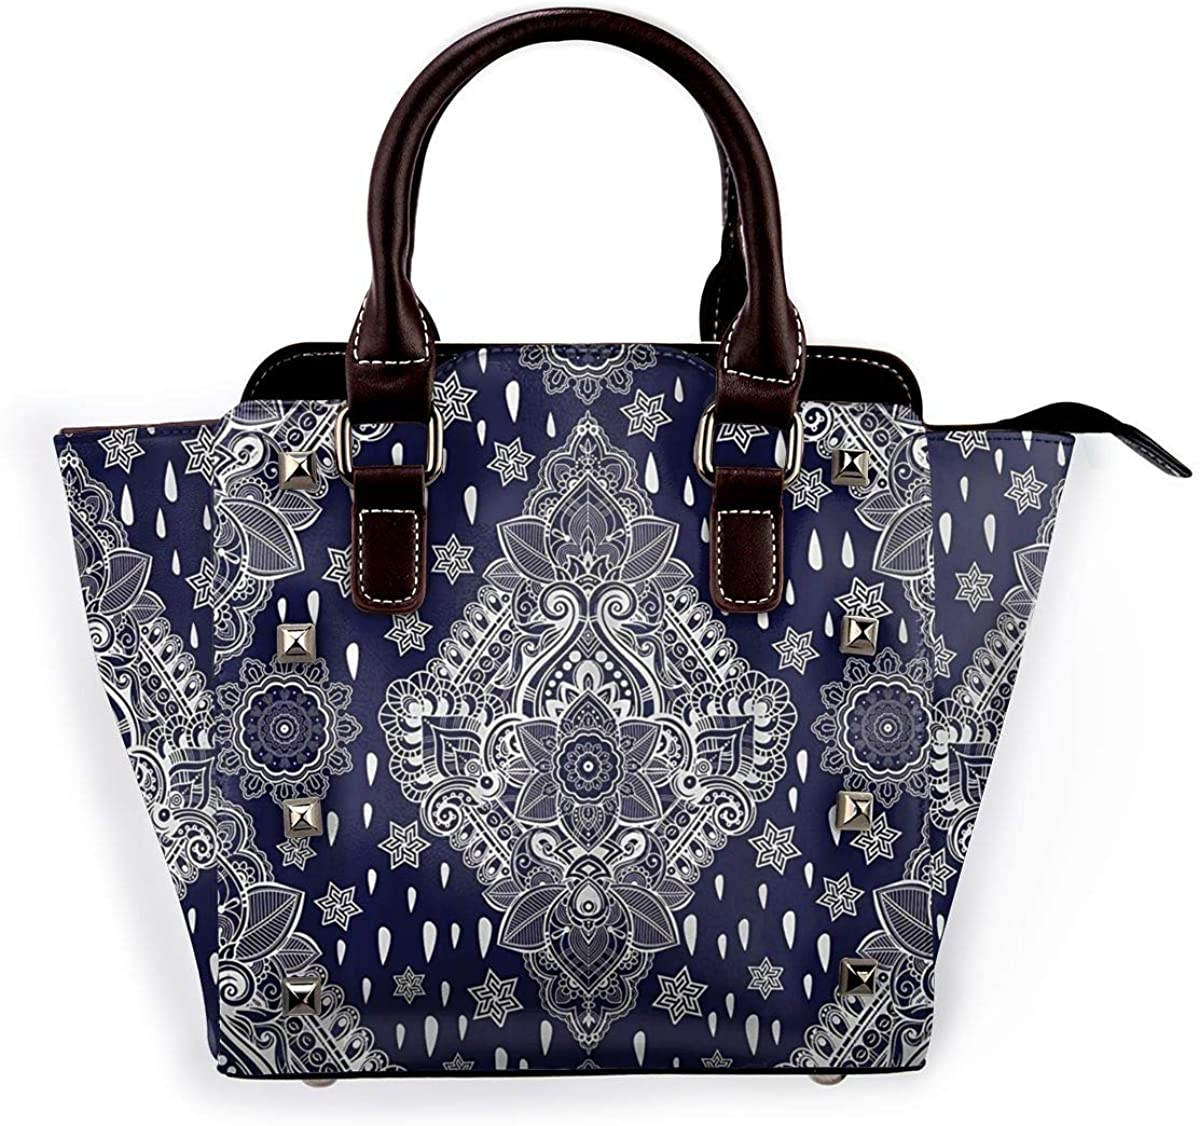 Womens Top Handle Satchel Handbag Ethnic Mandala Ladies PU Leather Shoulder Bag Crossbody Bag